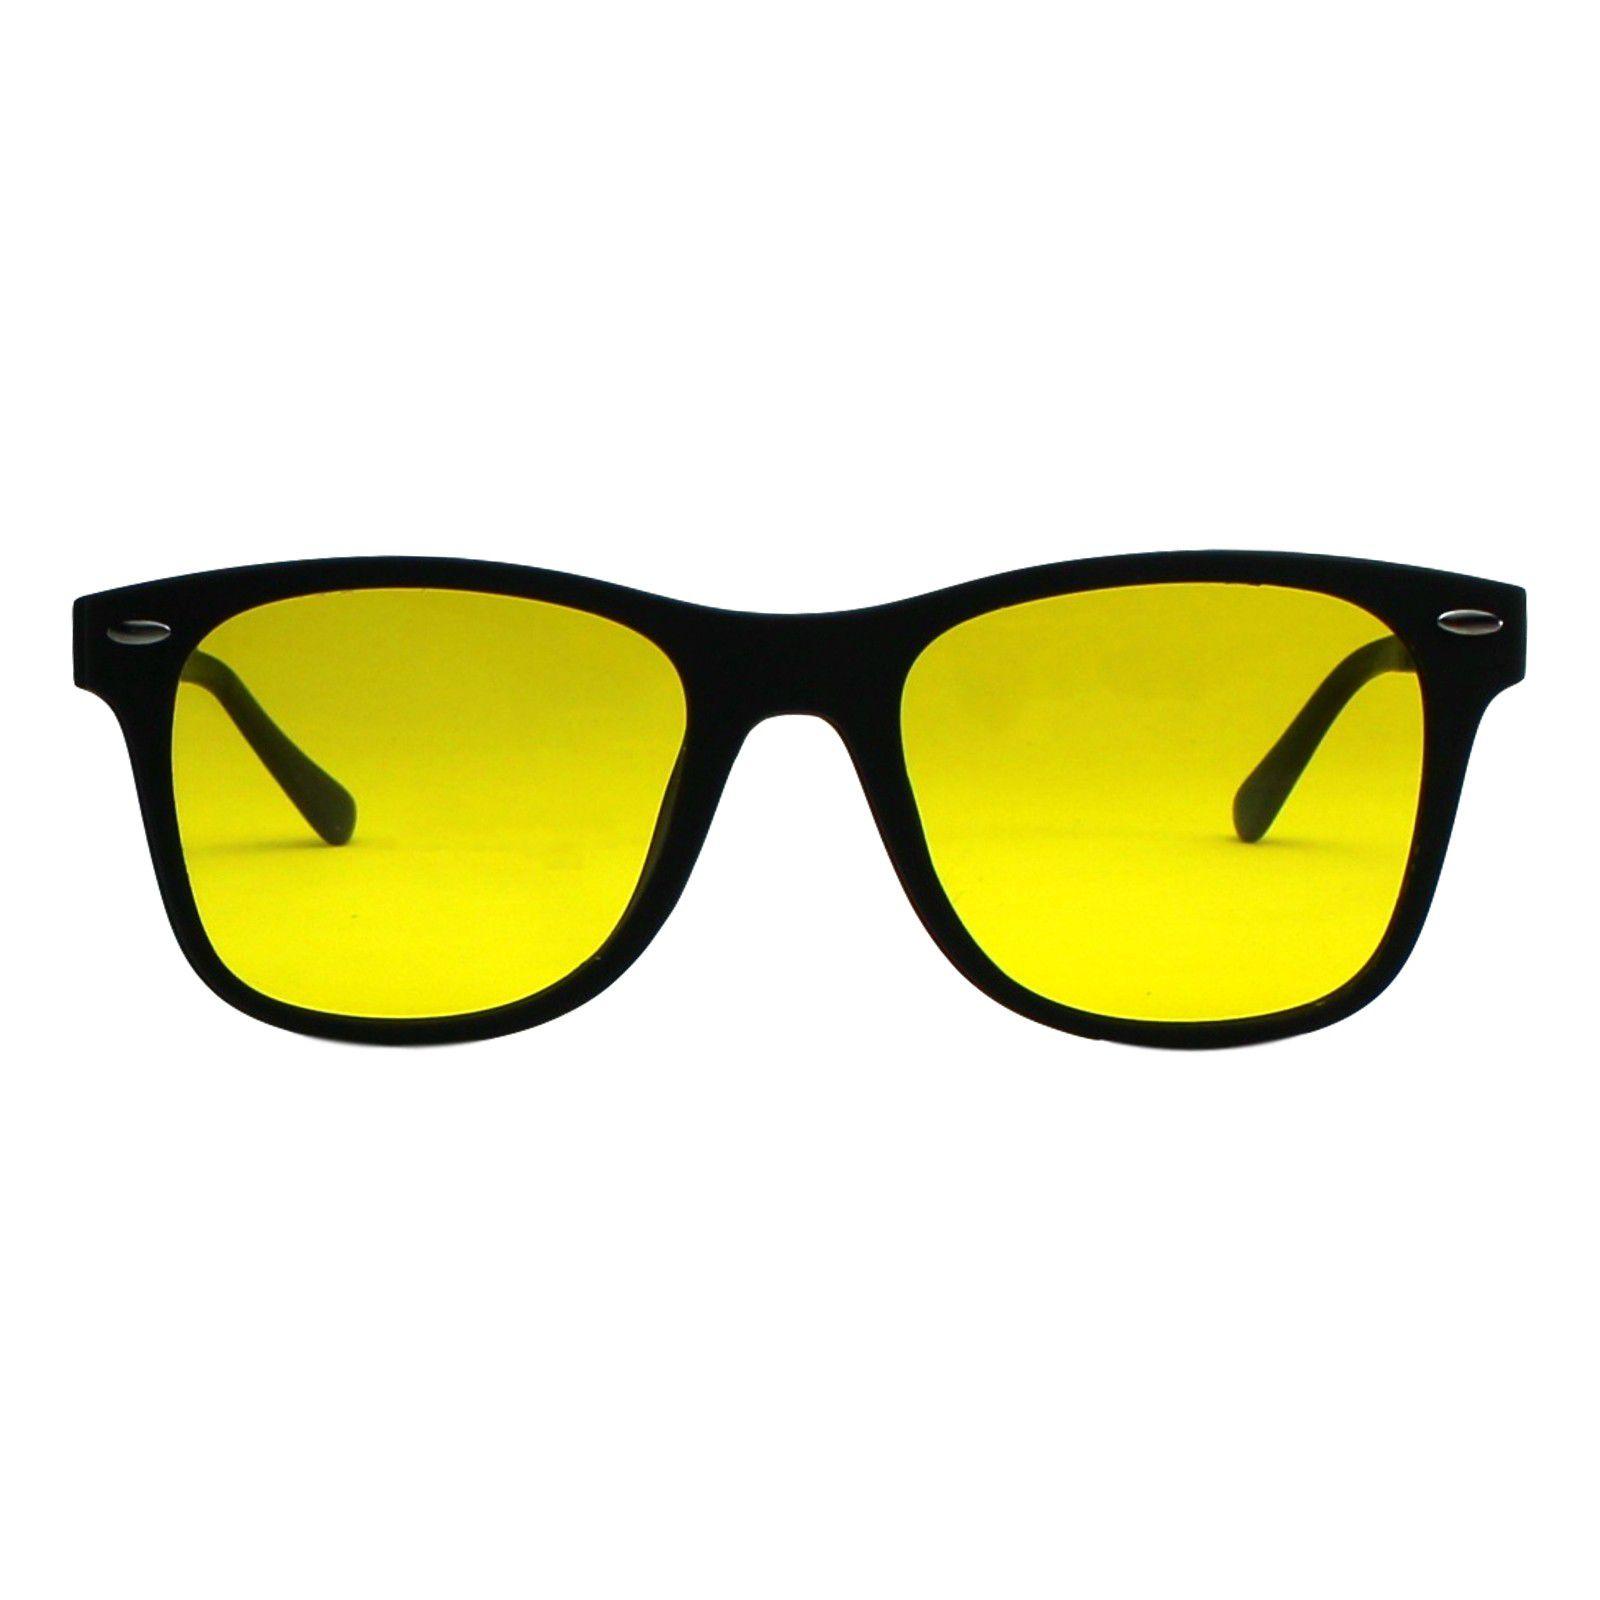 ... Armação para Óculos Díspar D1965 Clip On 2 Lentes - Preto - Díspar Style  ... bdb5473745